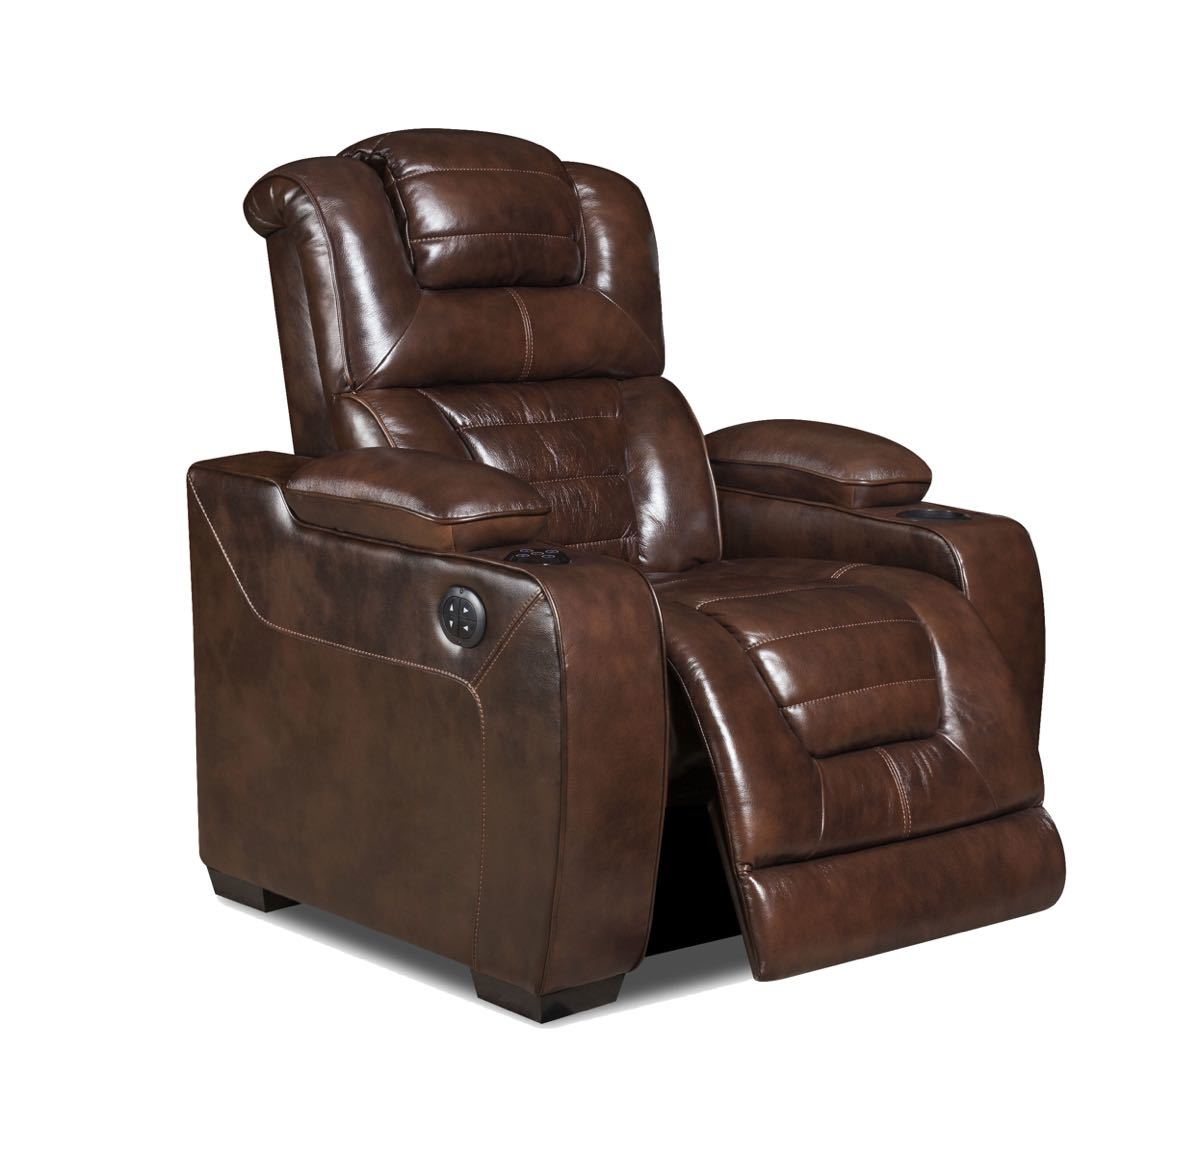 Corinthian 73901 Motion Recliner in Desert Chocolate $529